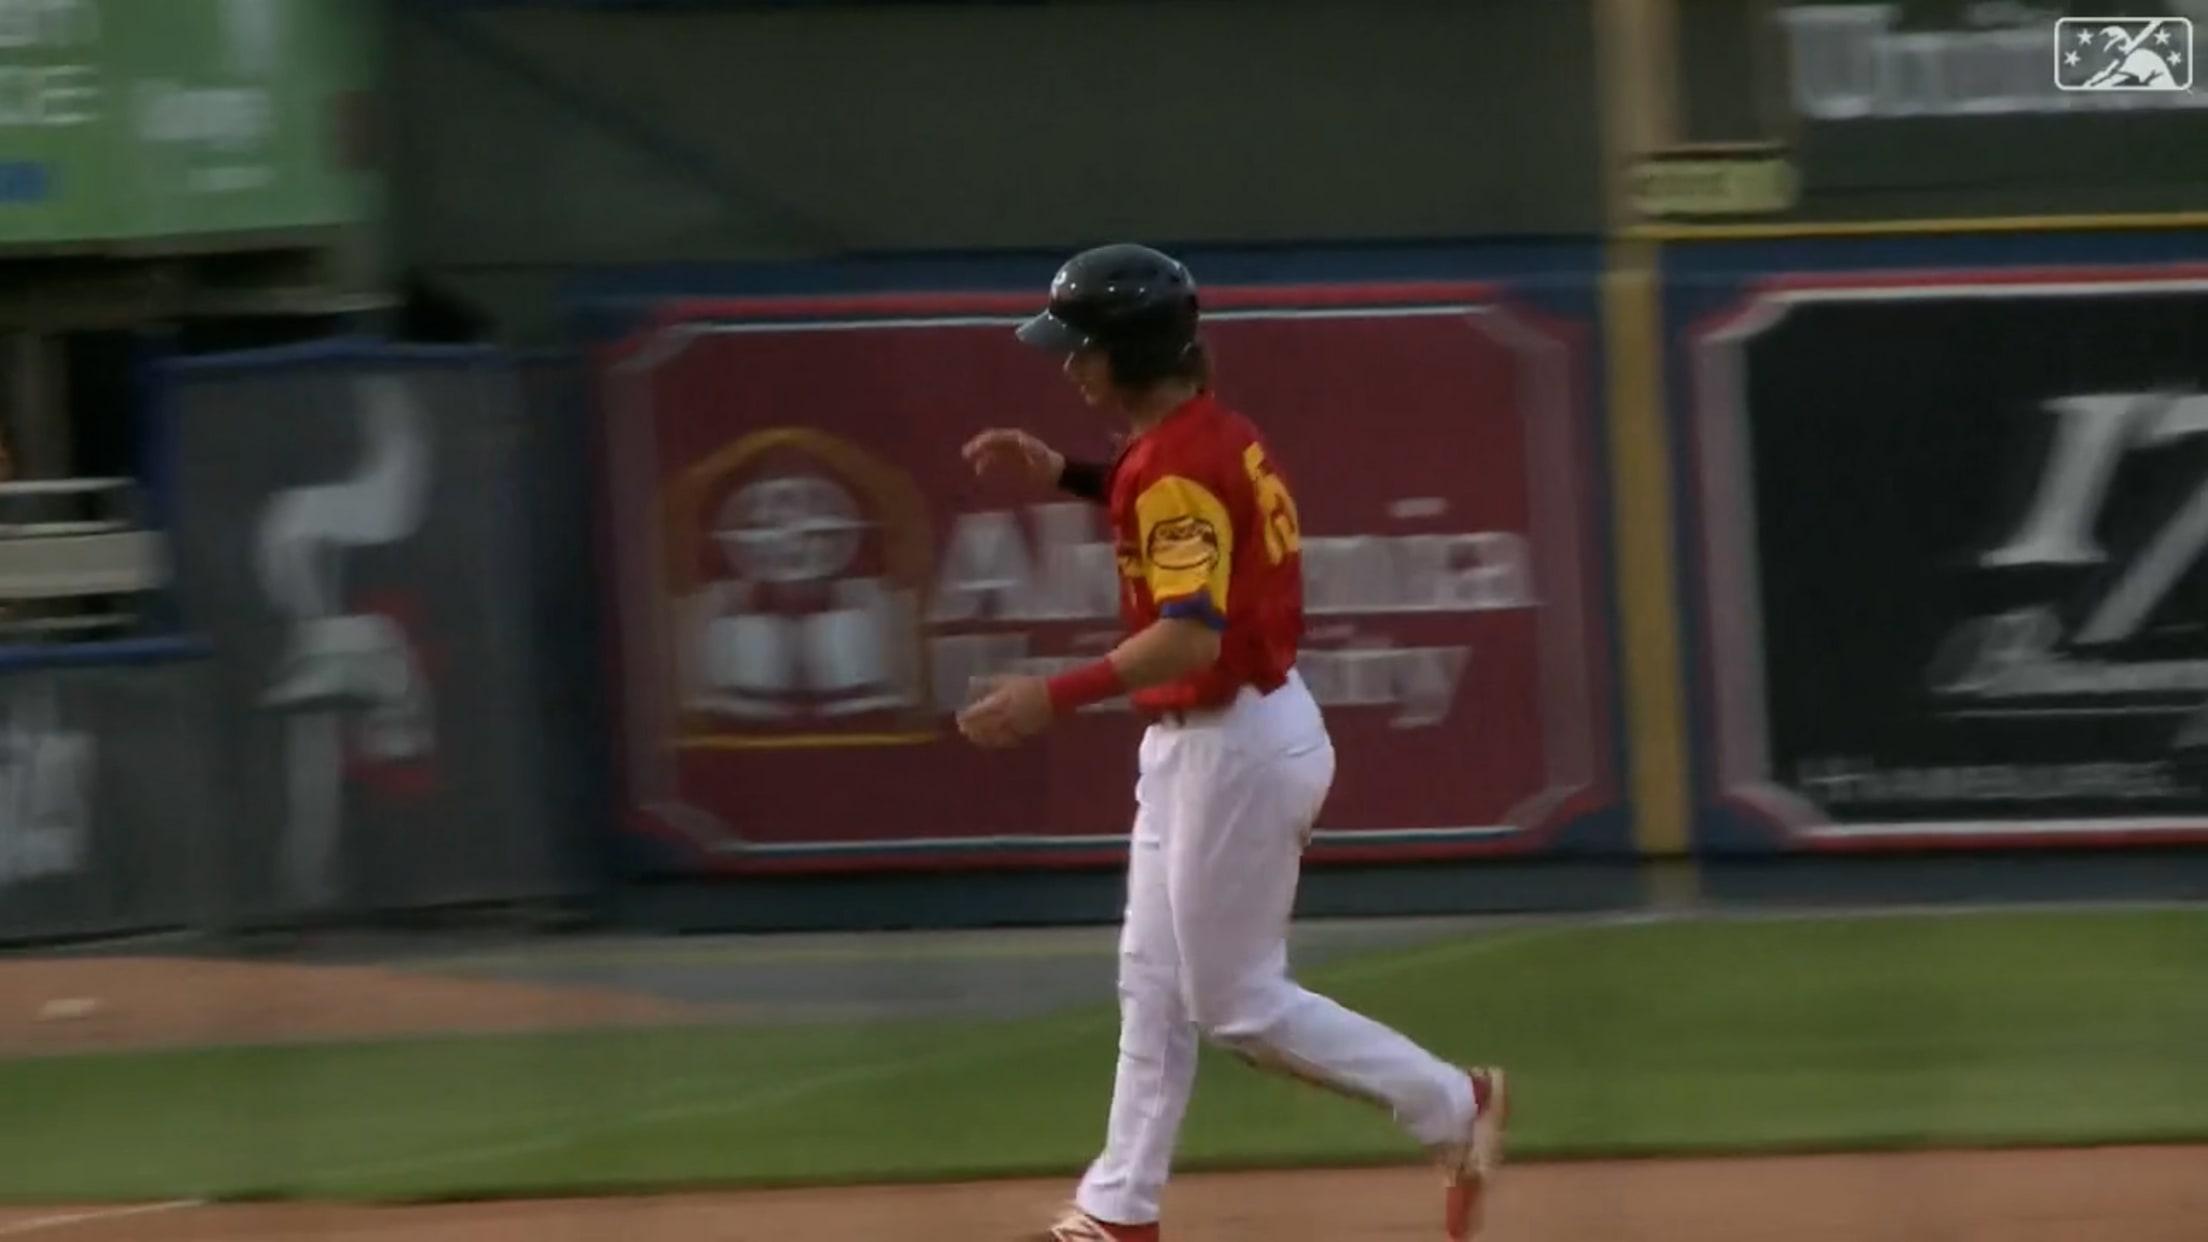 Stott lines his 8th homer